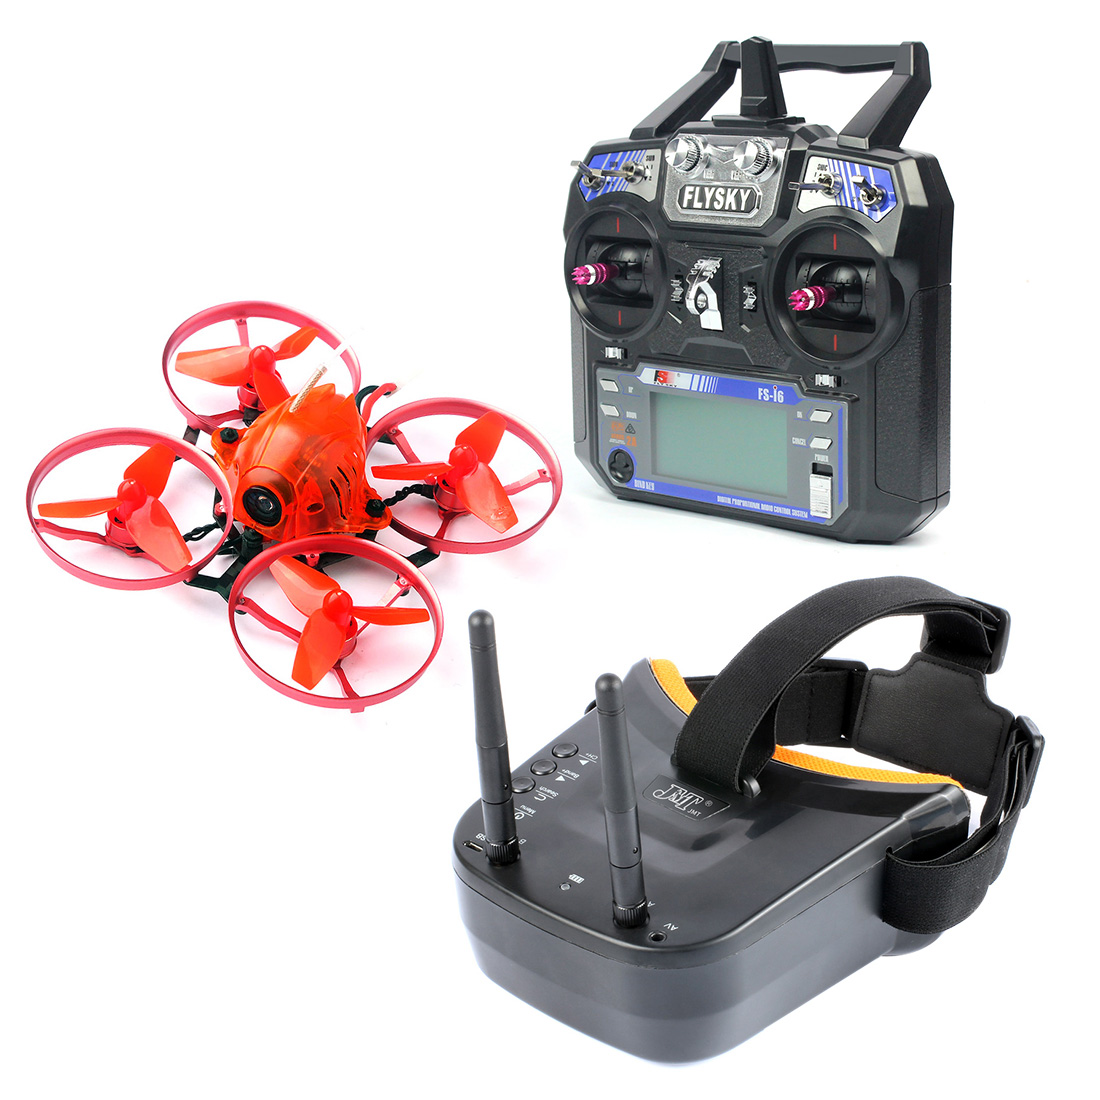 Snapper7 Brushless Micro 75mm 5.8g FPV Racer Drone 2.4g 6CH RC Quadcopter RTF 700TVL Caméra VTX et double Antenne Mini Lunettes